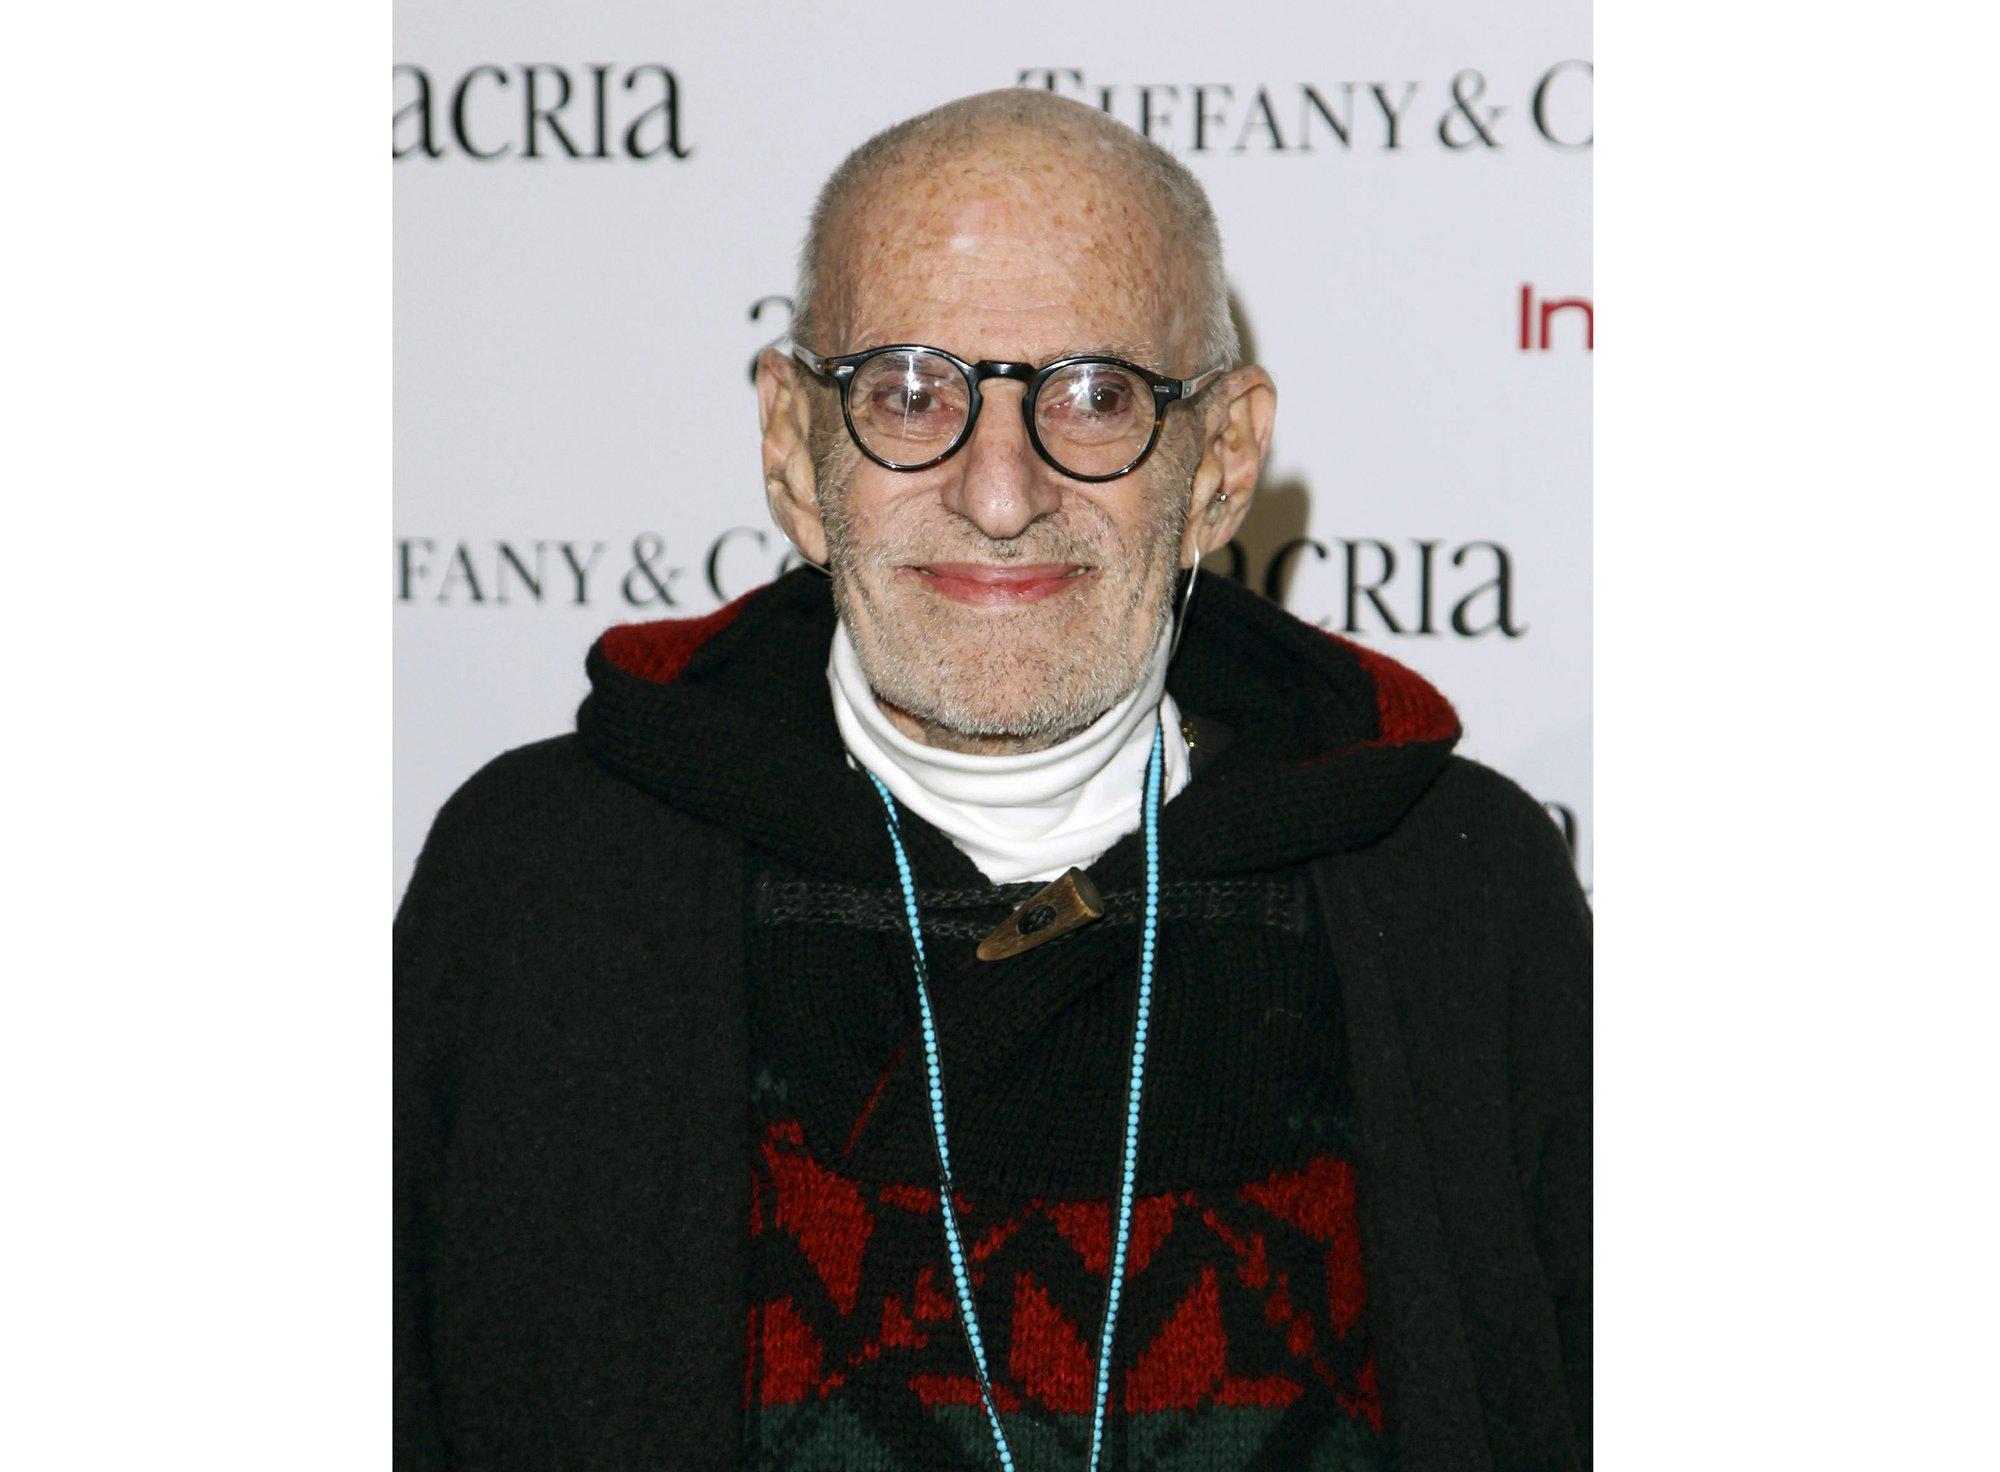 apnews.com - Mark Kennedy - Larry Kramer, playwright and AIDS activist, dies at 84